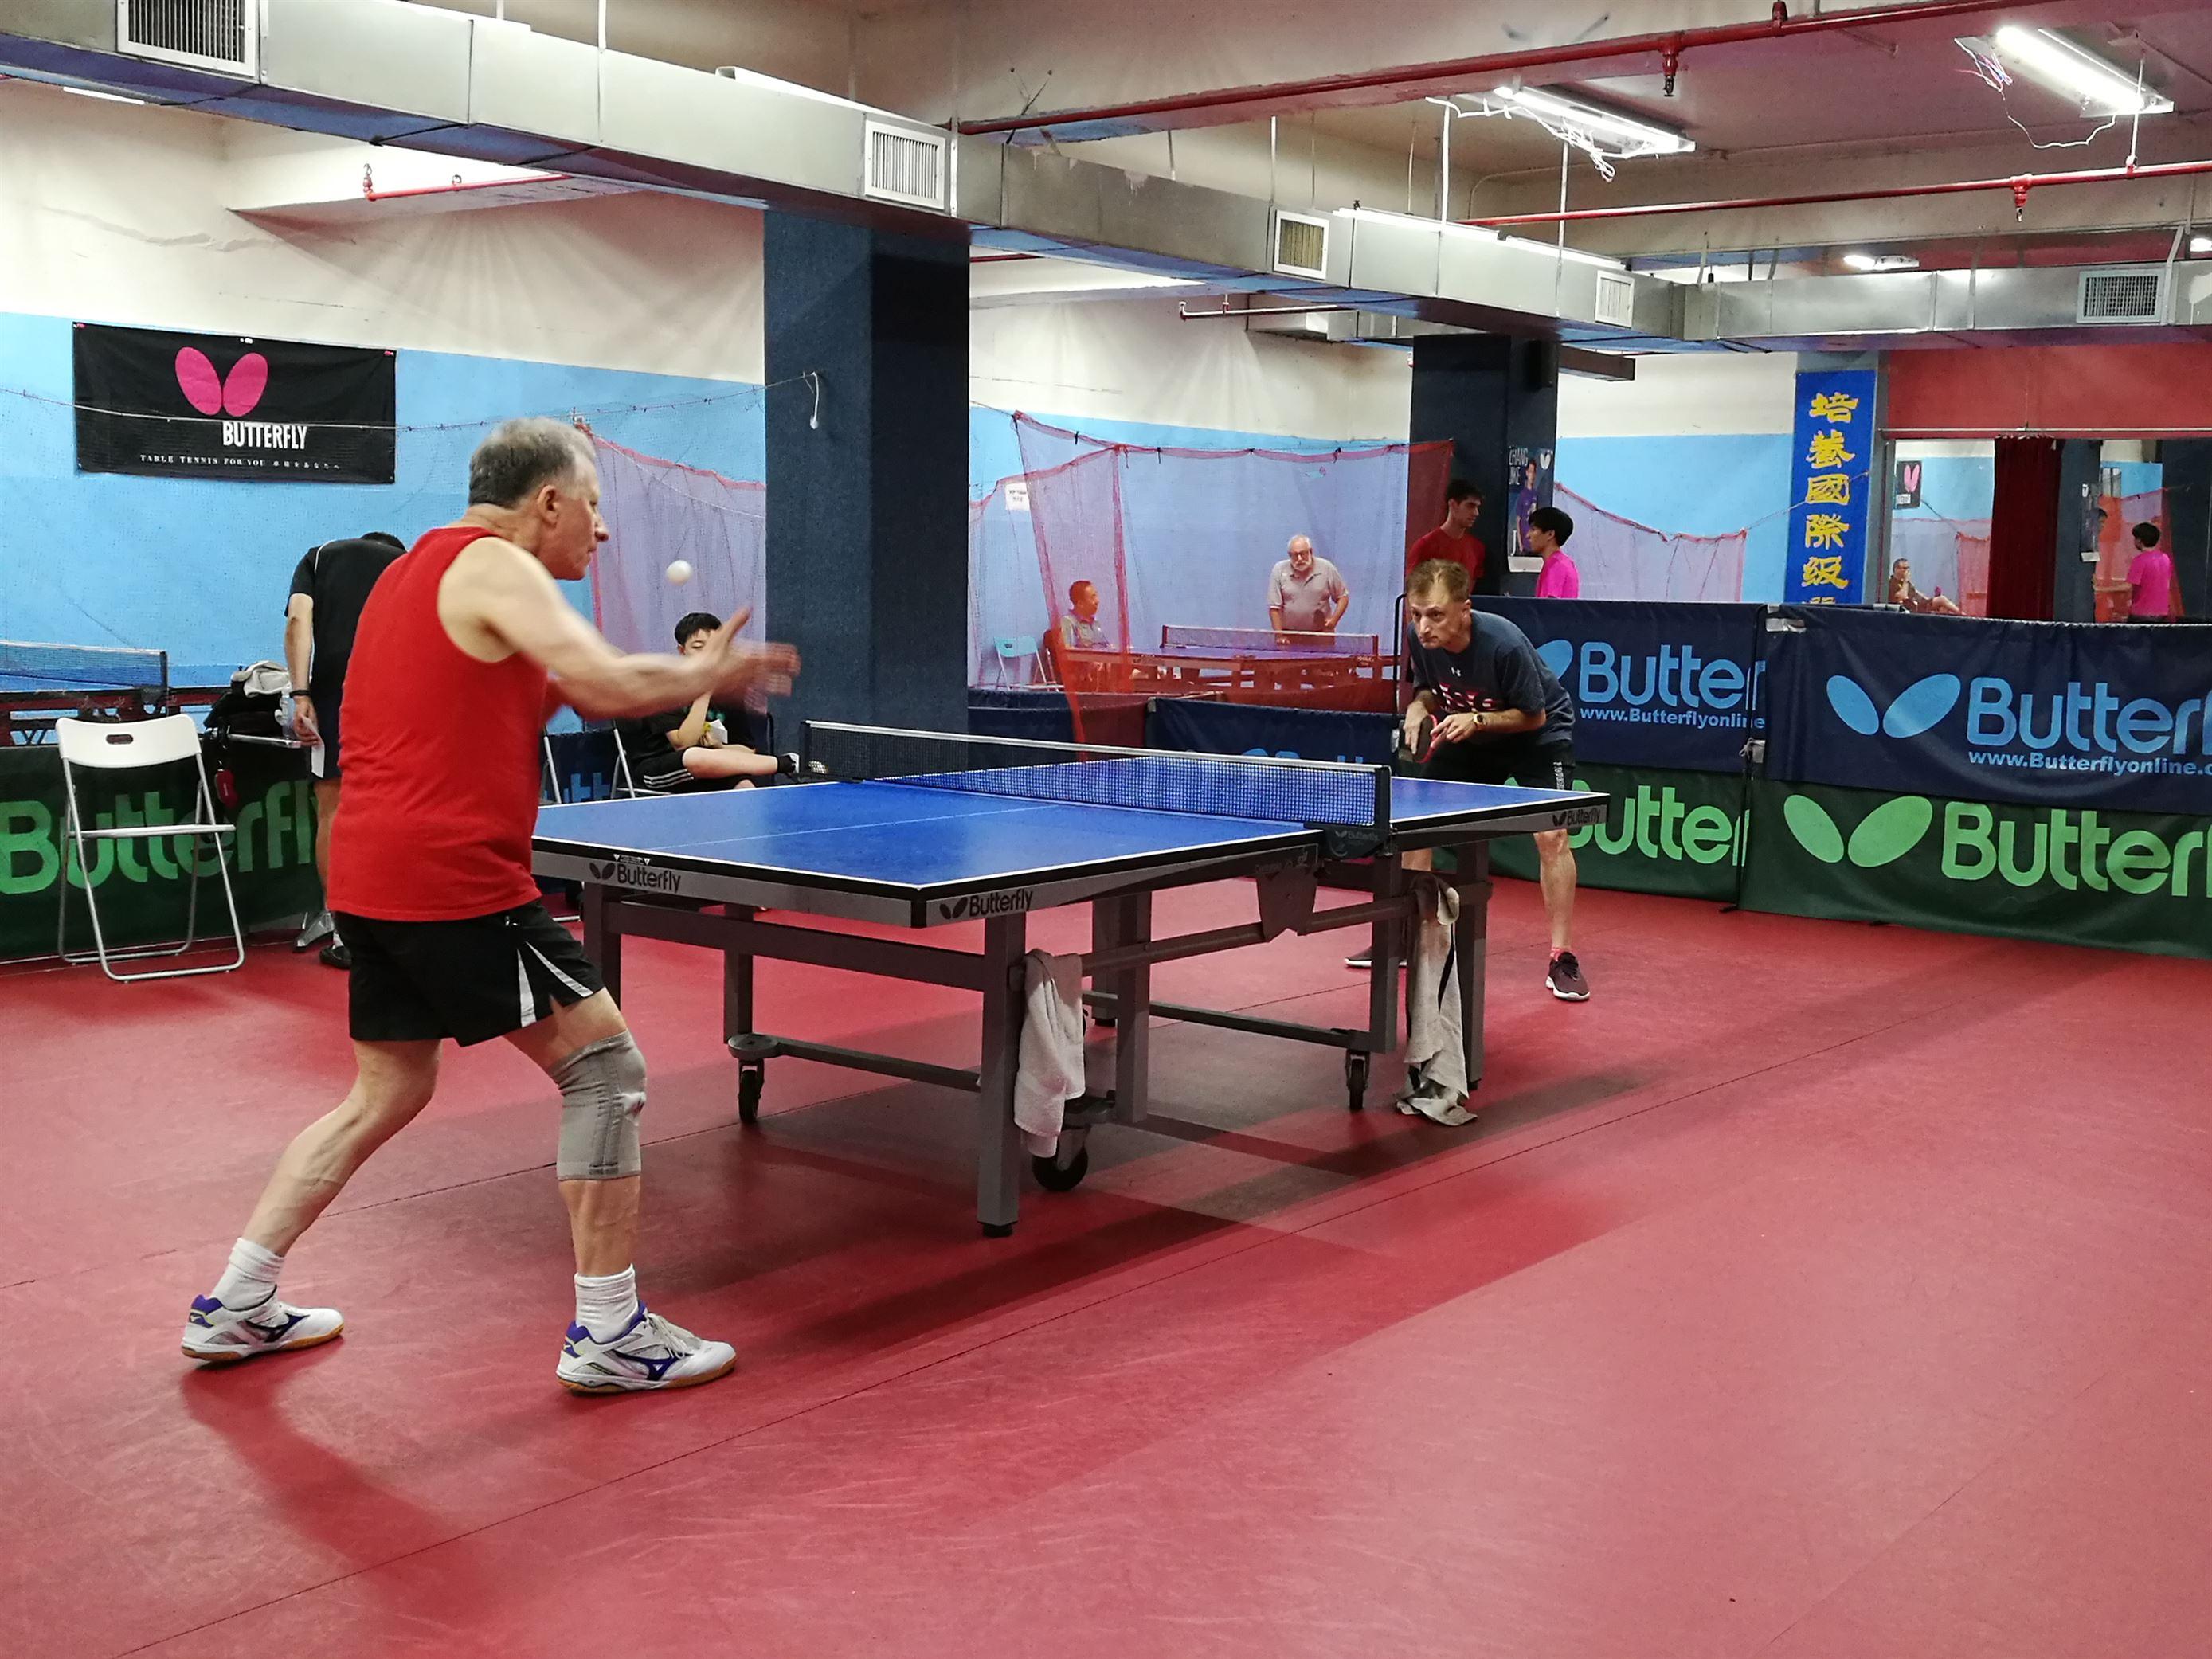 New York International Table Tennis Center Aug. 4, 2019 Open Results